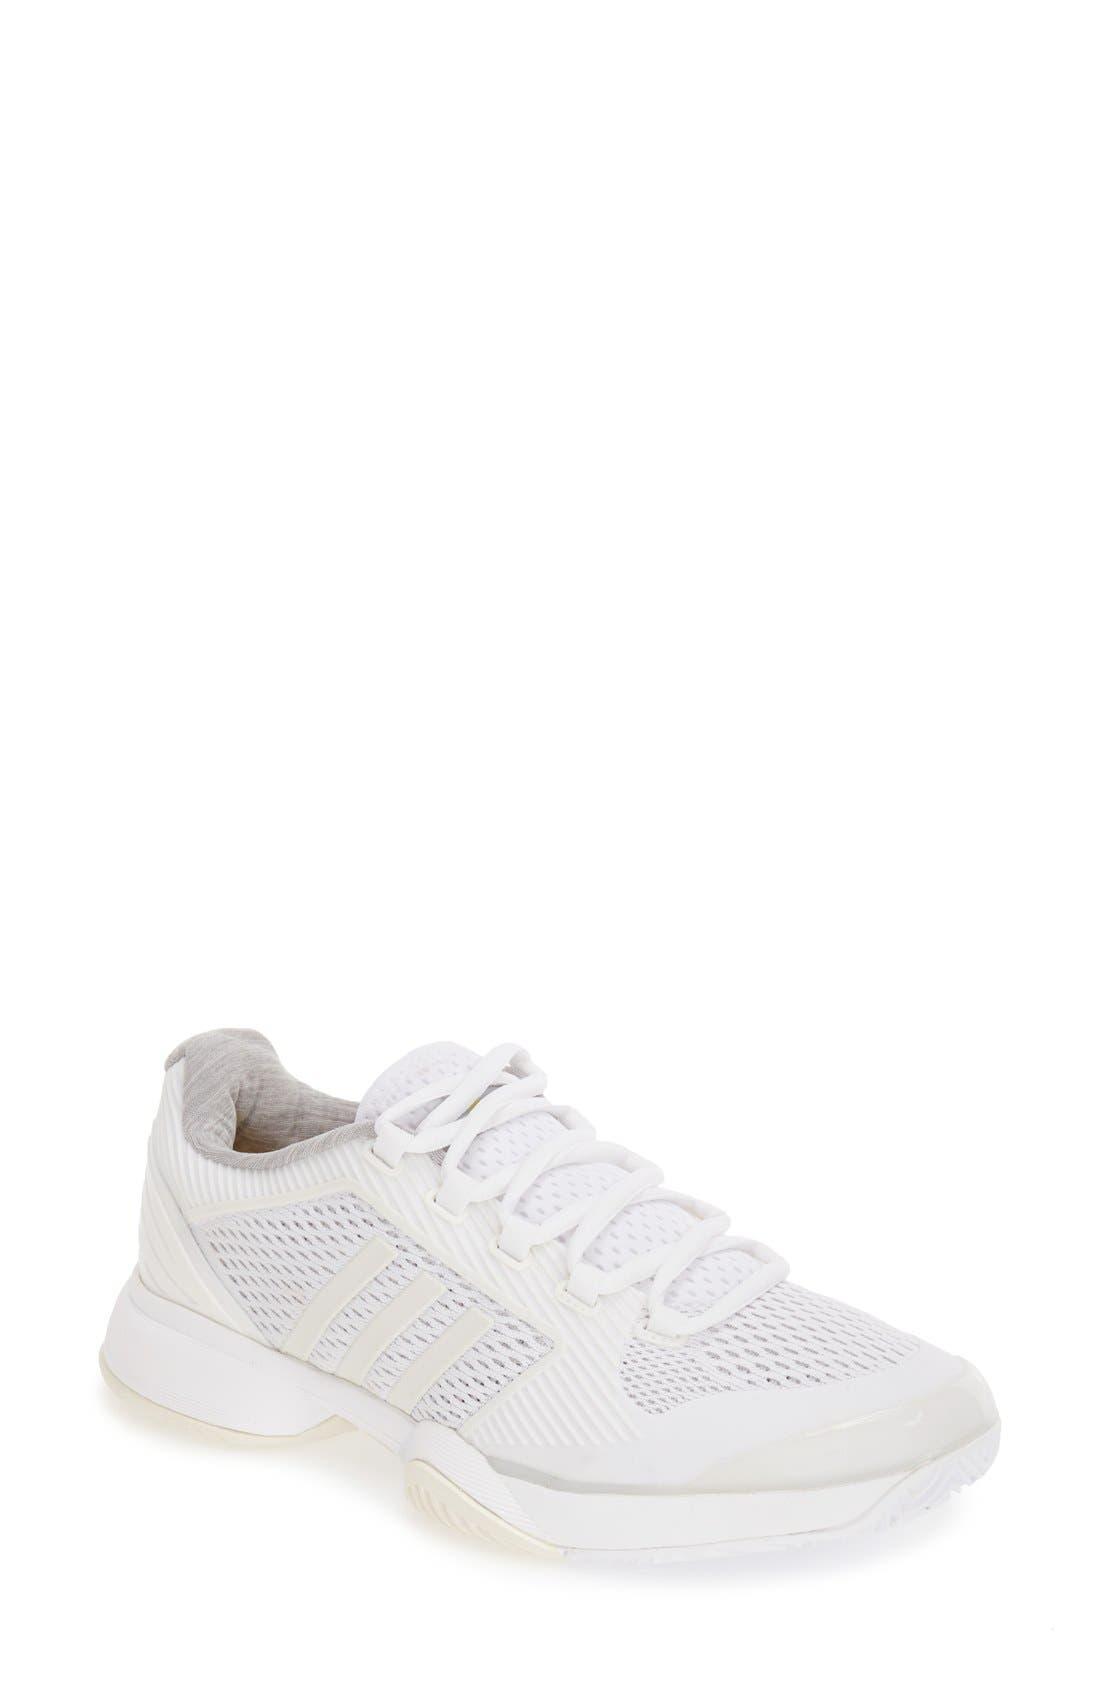 Main Image - adidas 'Stella McCartney - Barricade 2015' Tennis Shoe (Women)